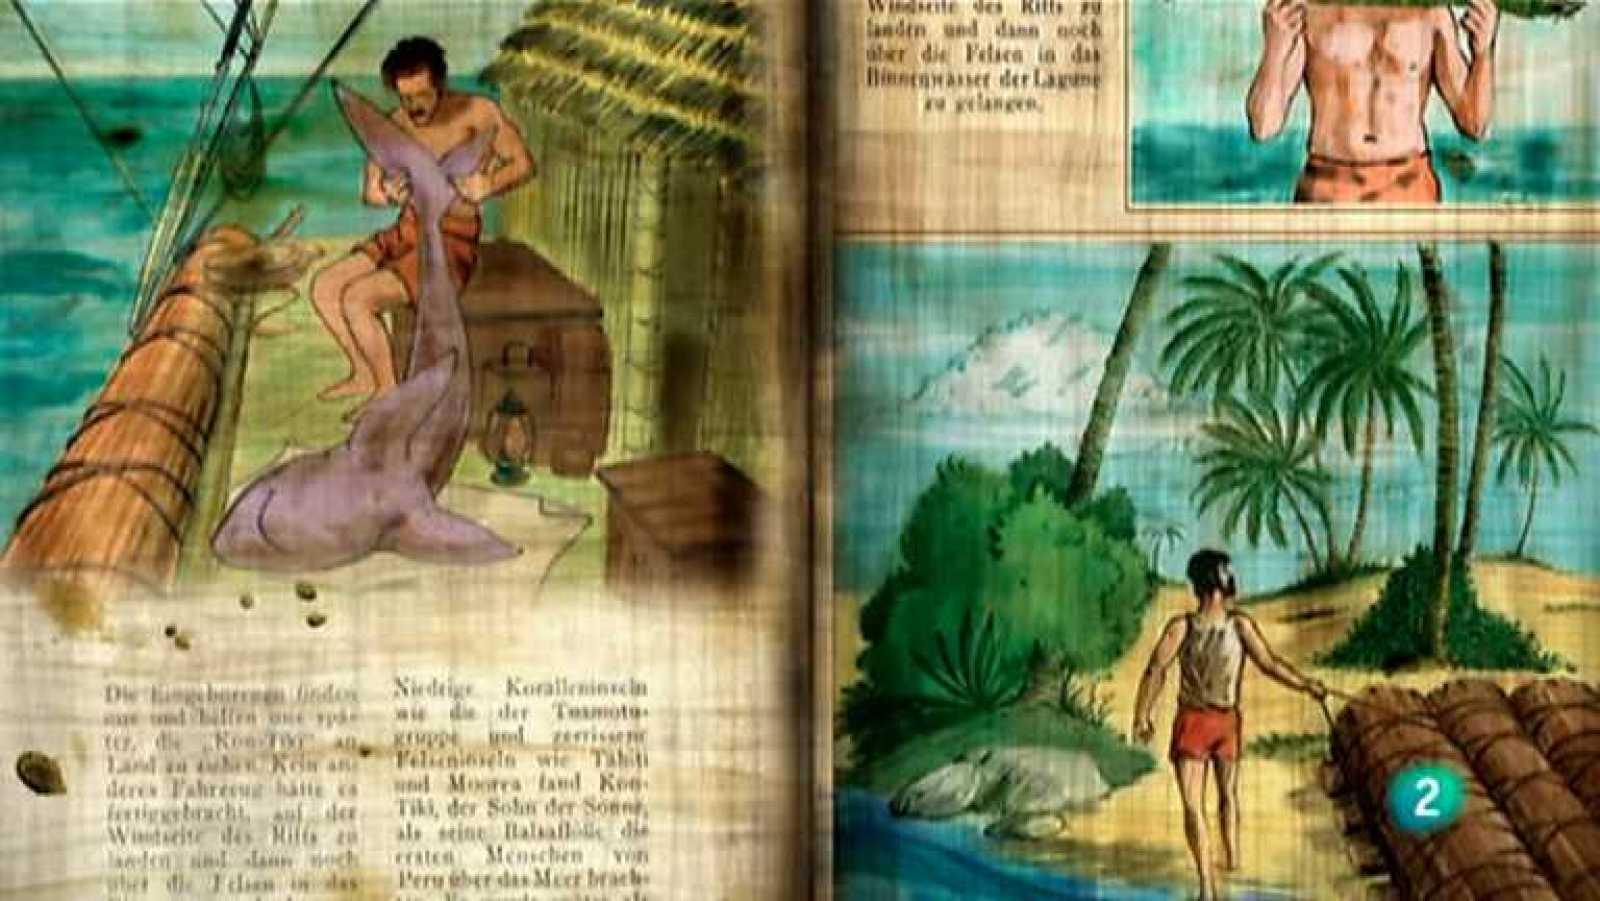 Historia de América Latina - Poblamiento de América latina  - Ver ahora